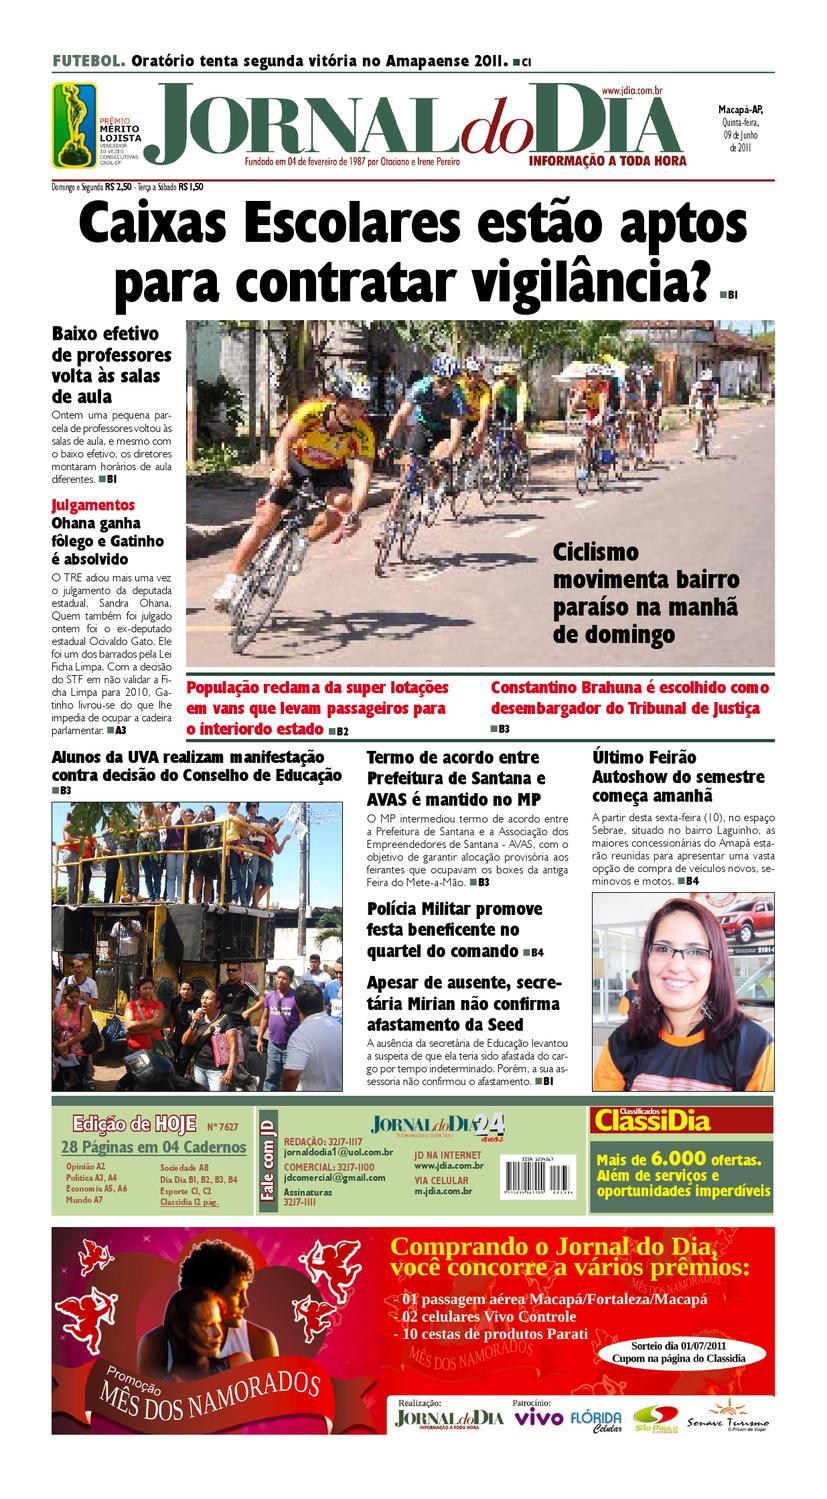 jdia 09 06 2011 by Jornal Do Dia - issuu 9d1d7fd3967